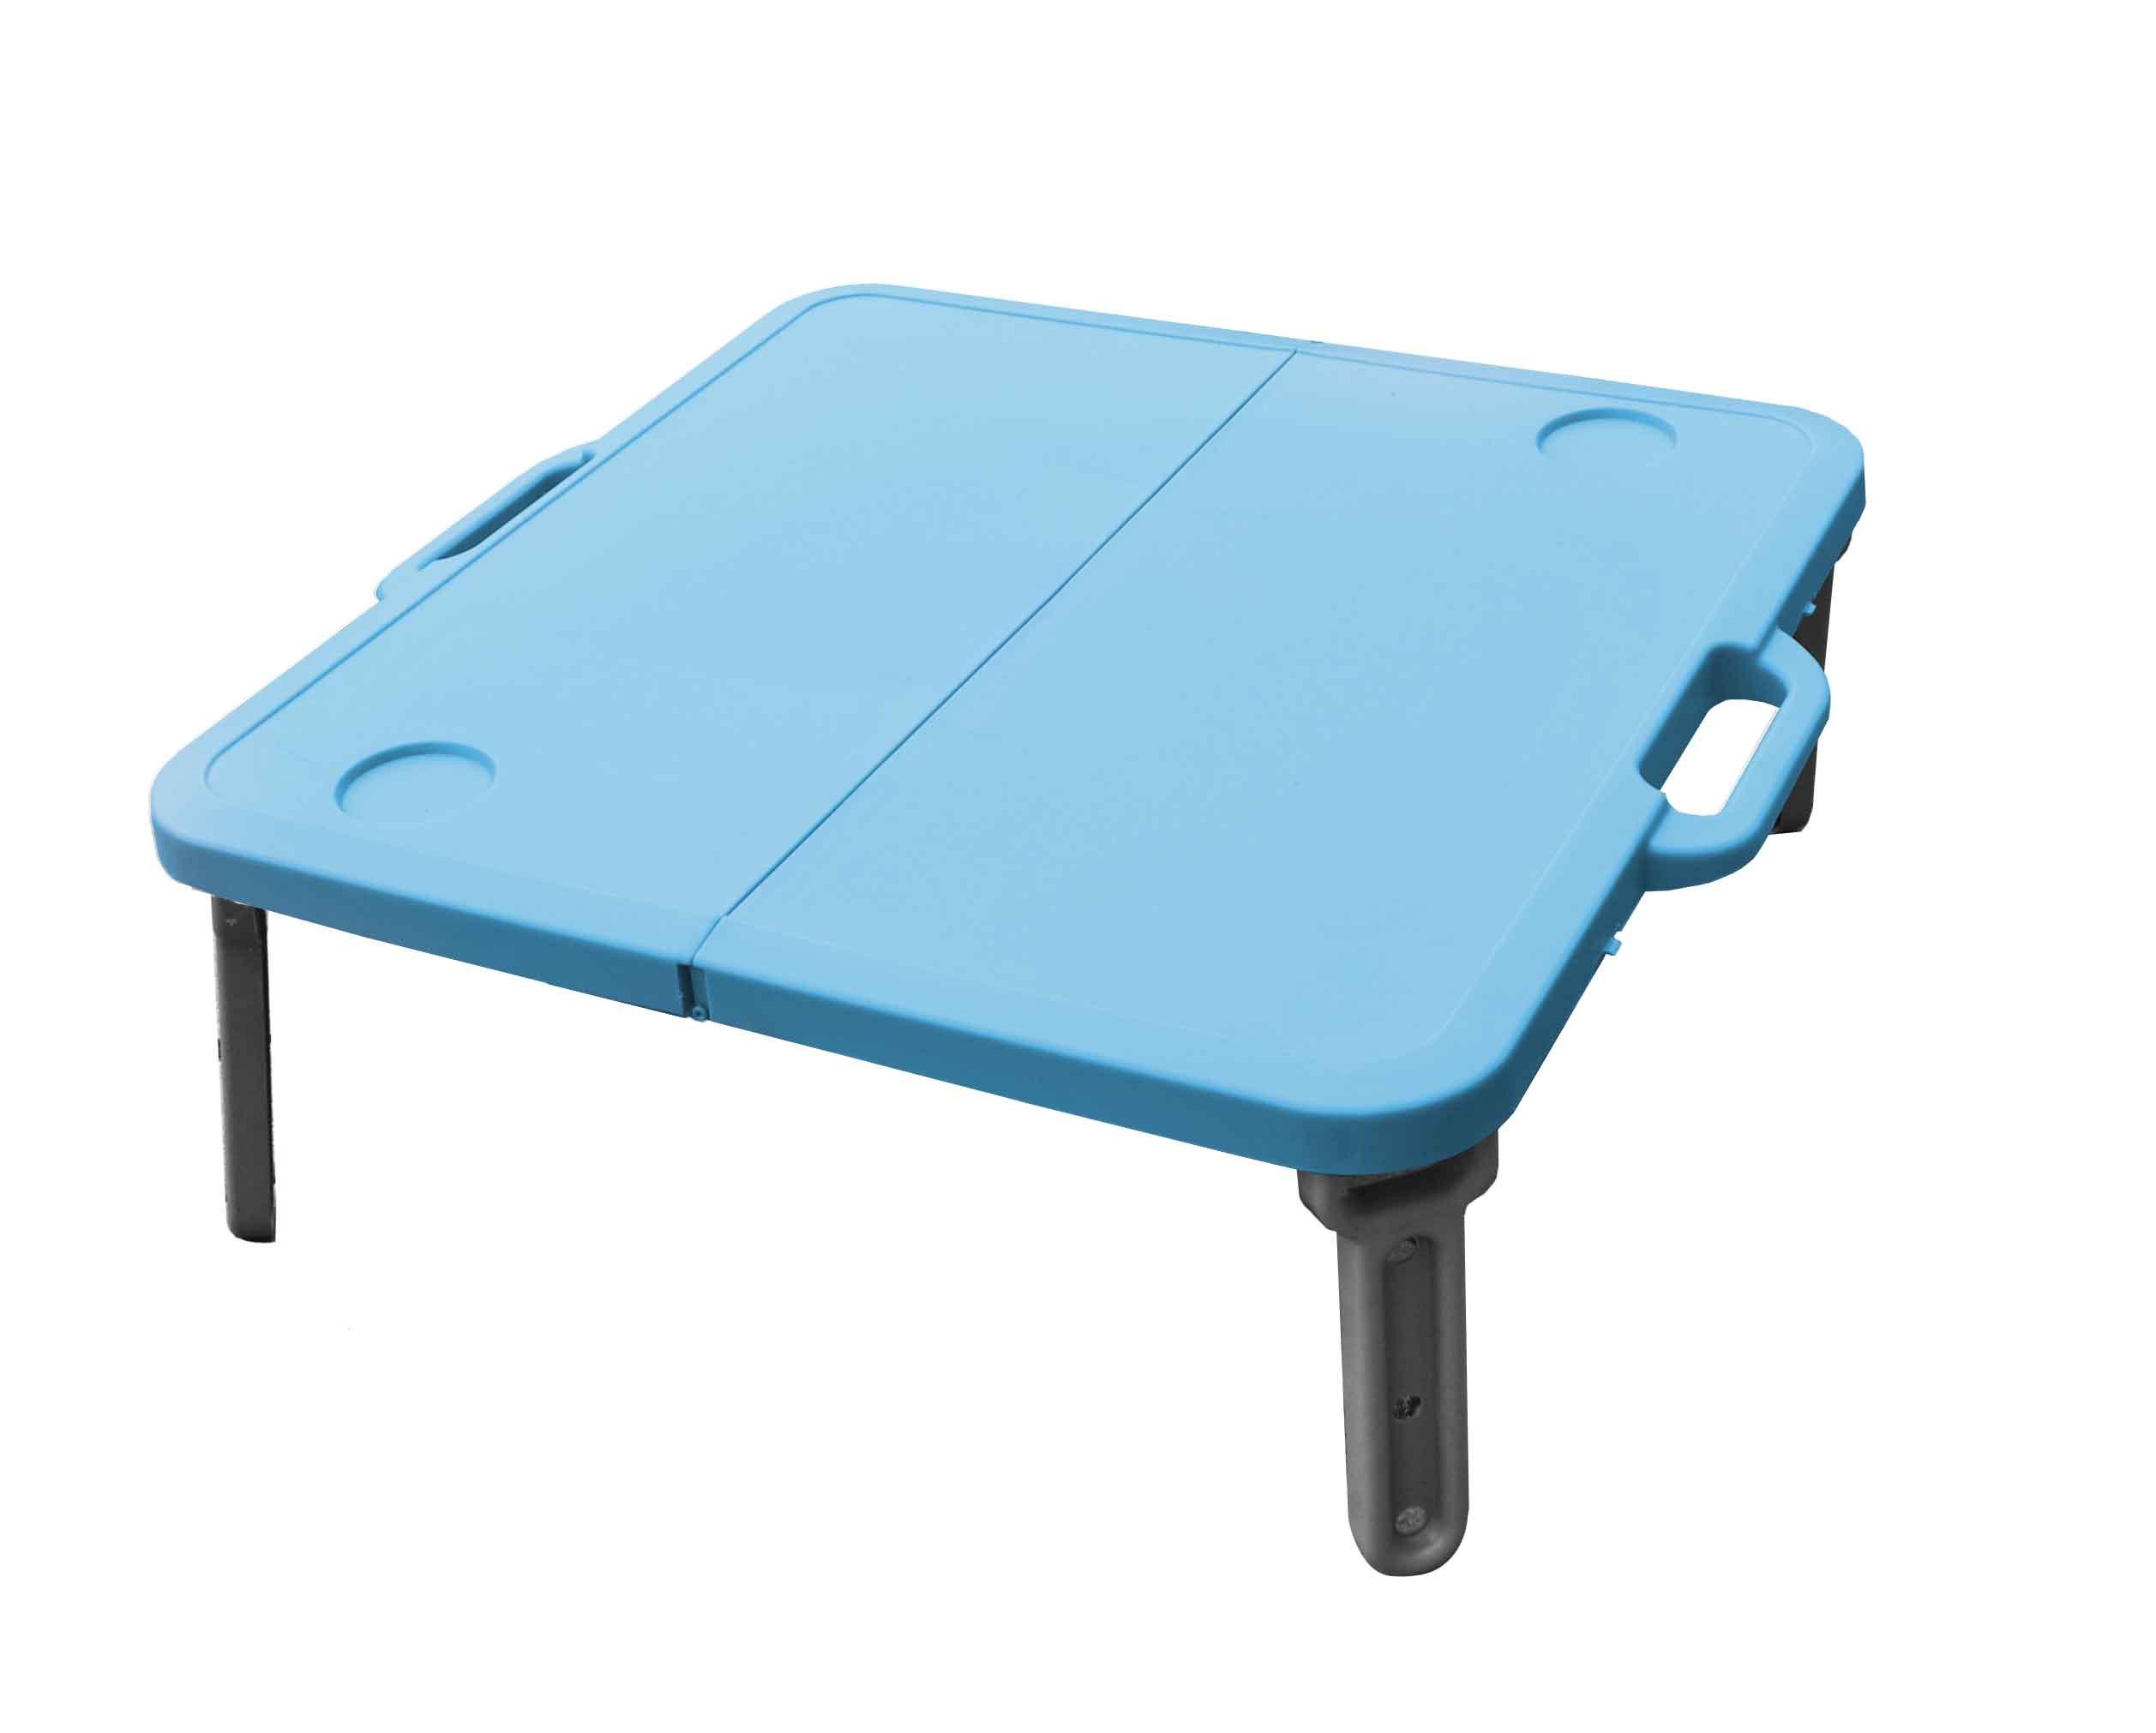 MINI skládací stolek k lehátku, modrý